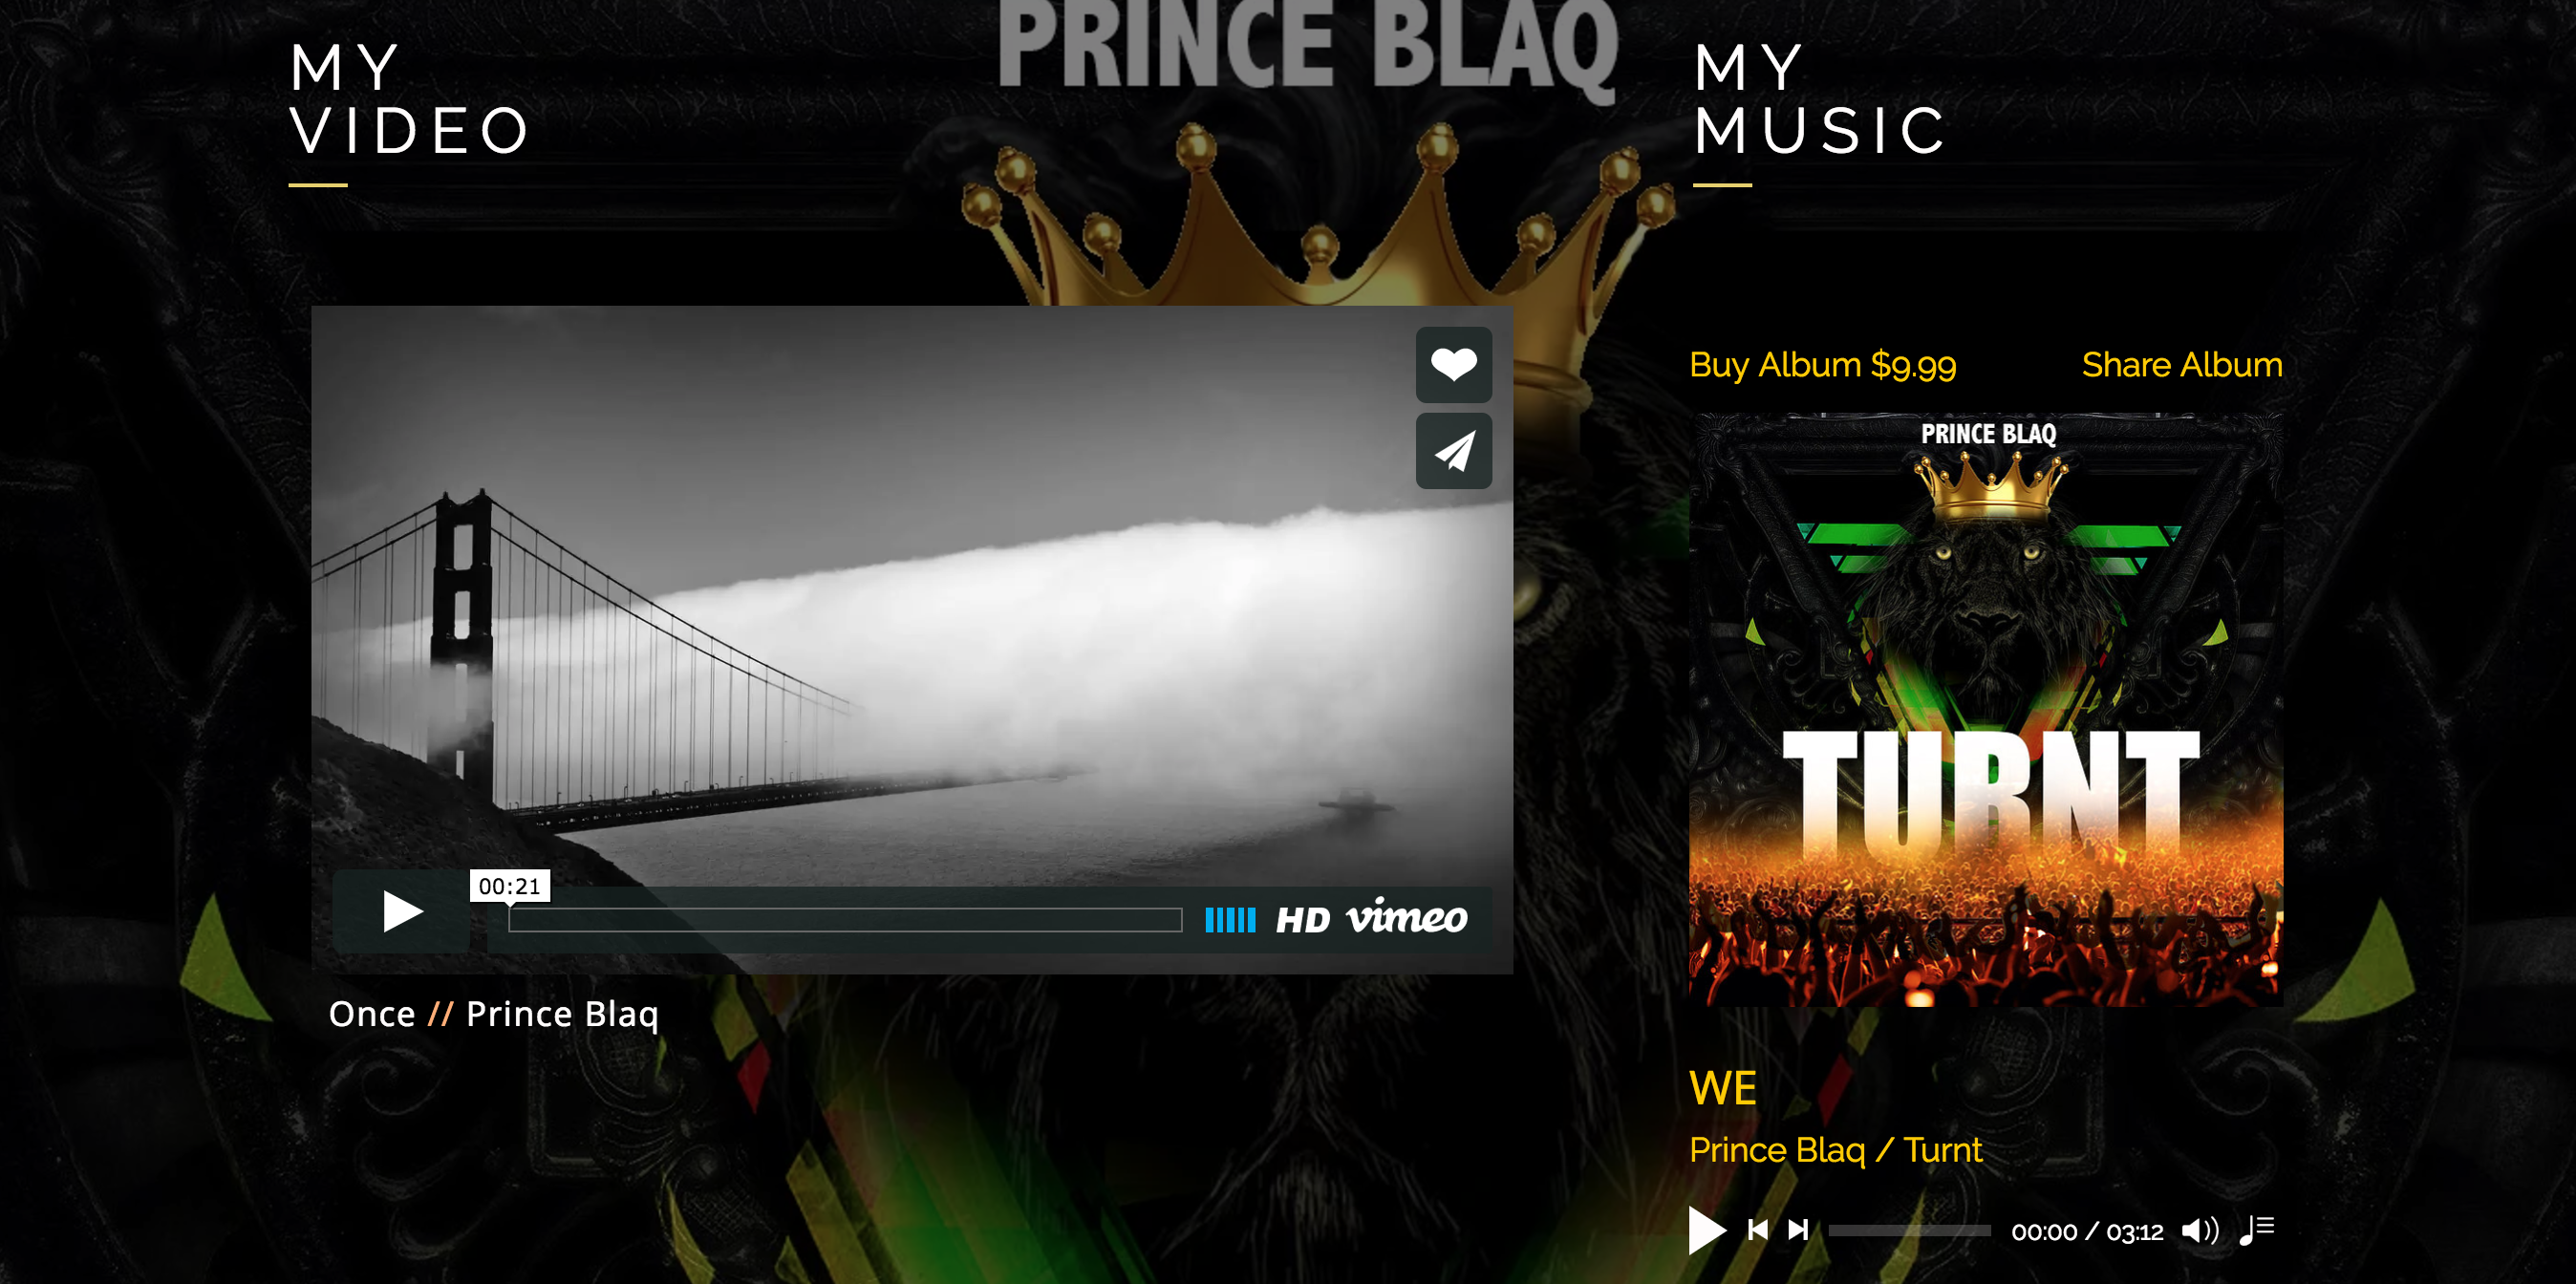 Prince Blaq music